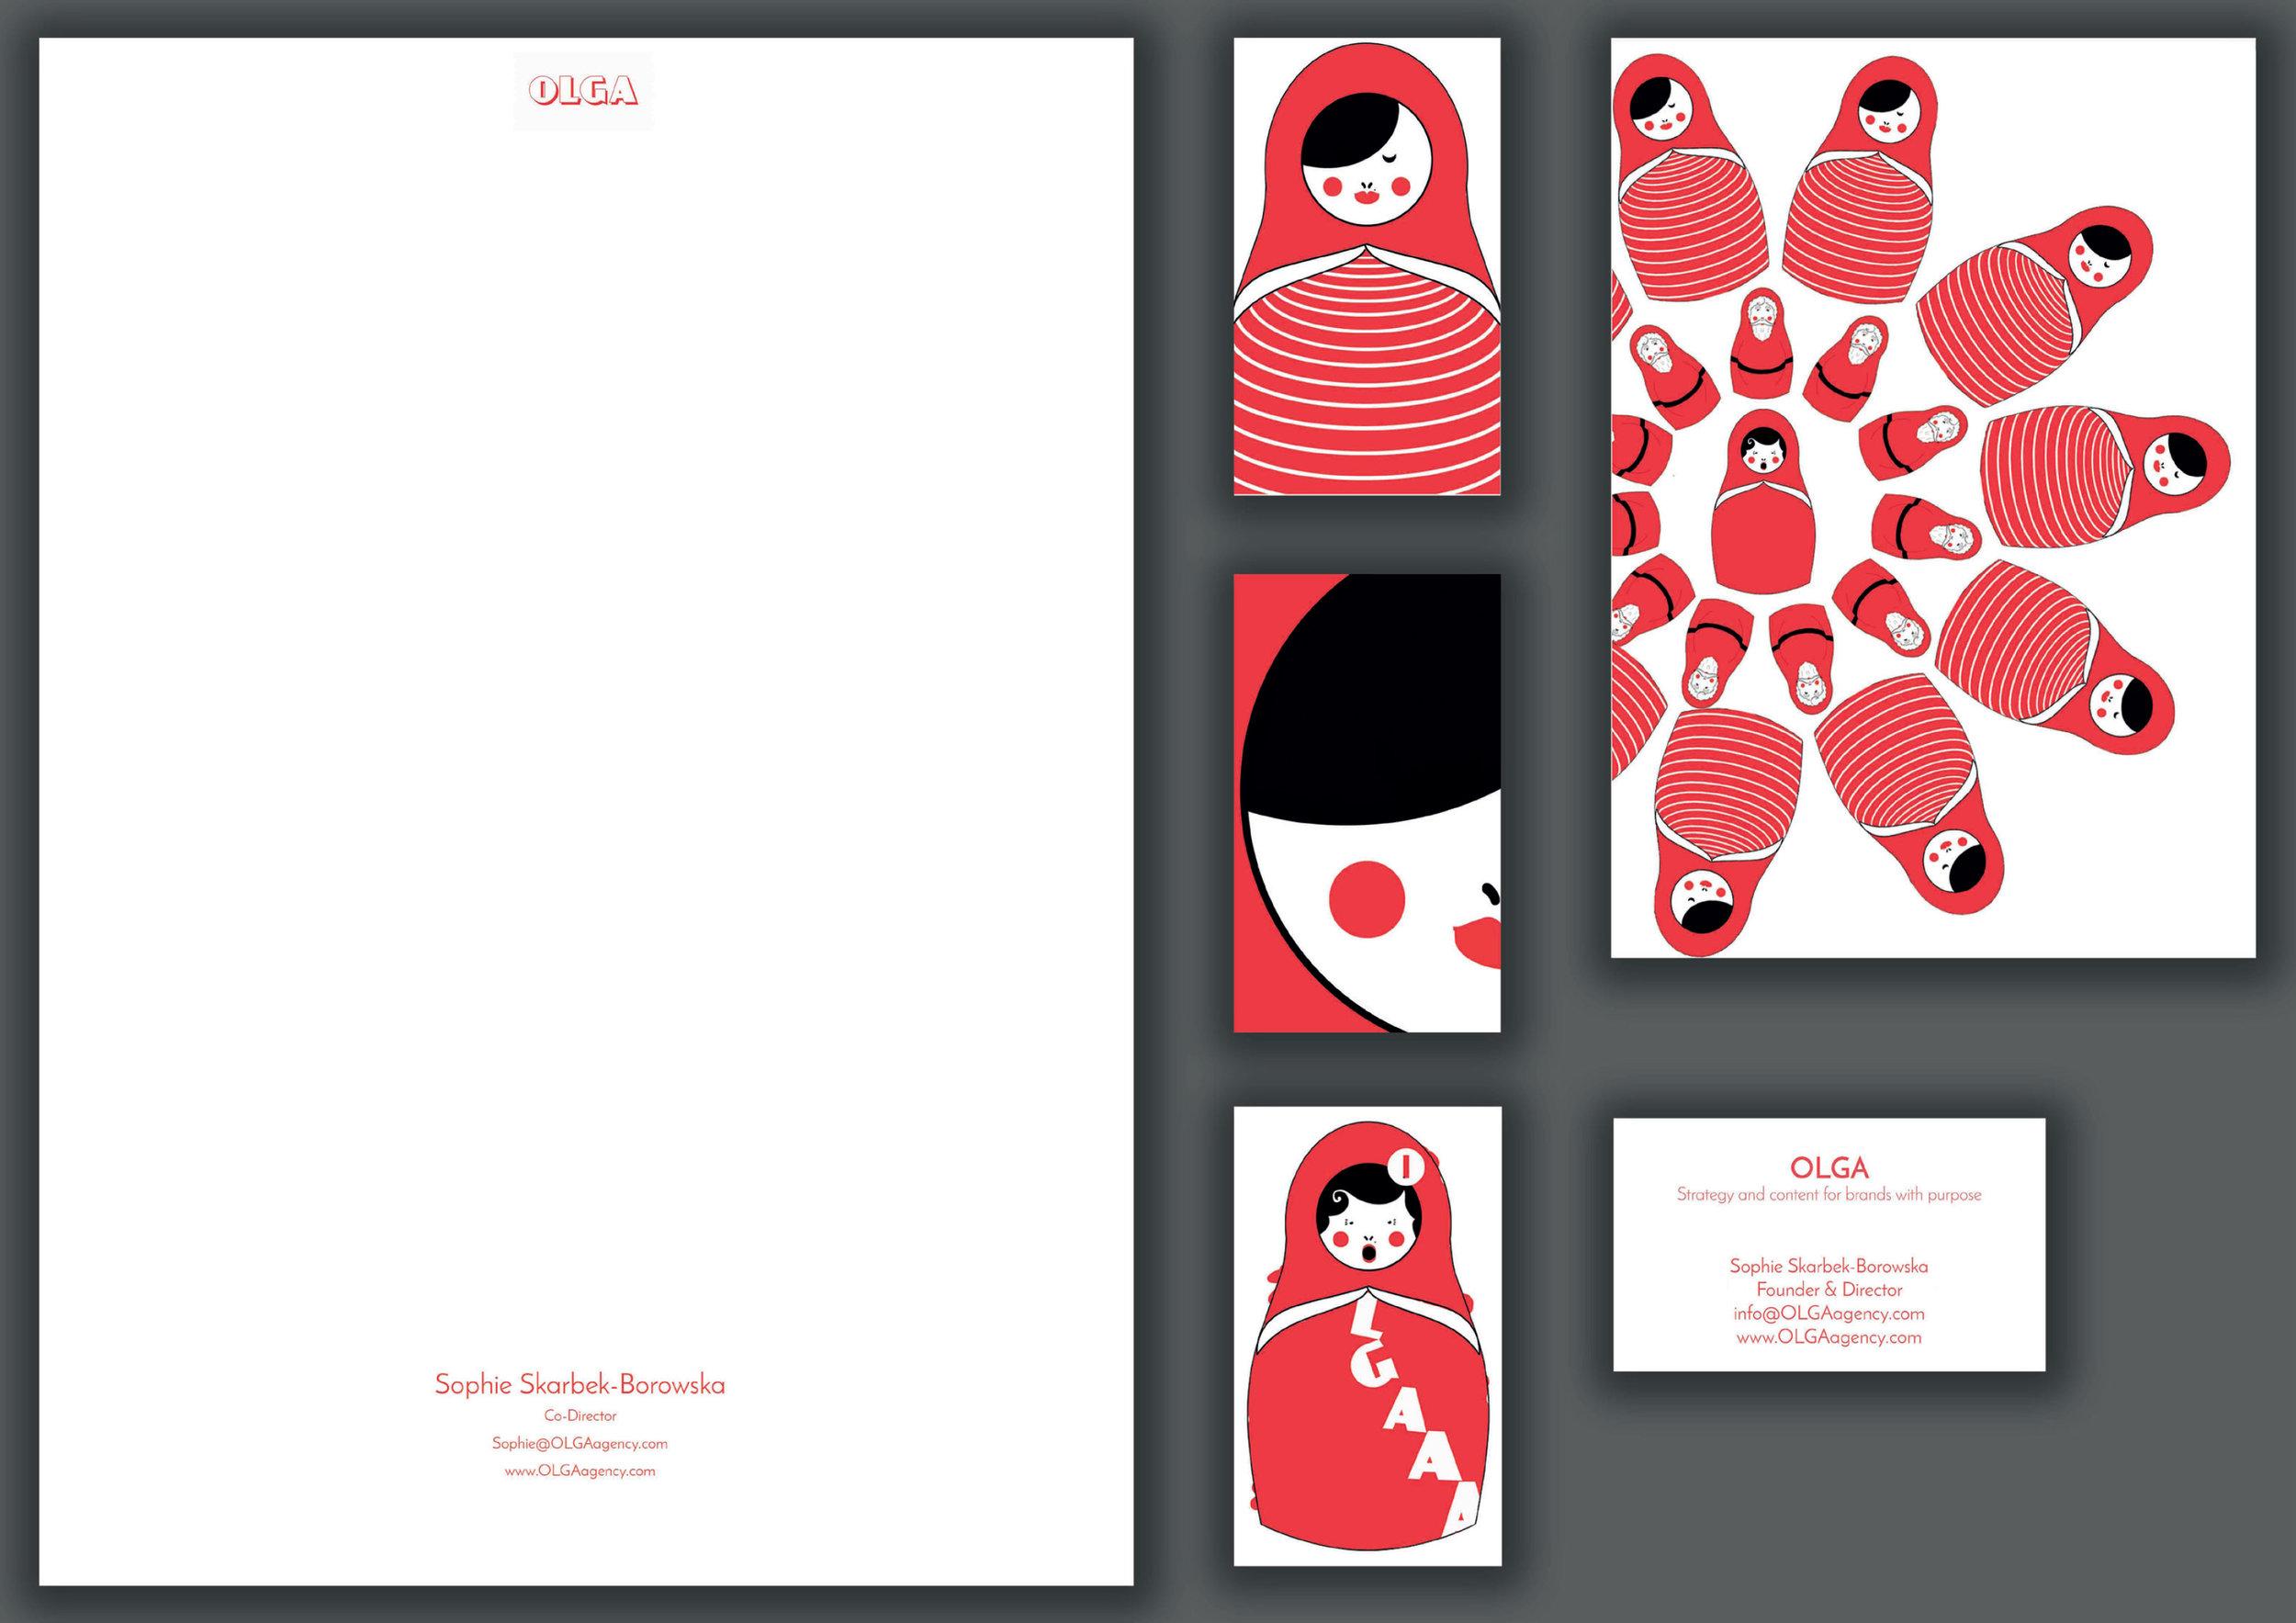 OLGA Design 2019 press qual-26.jpg